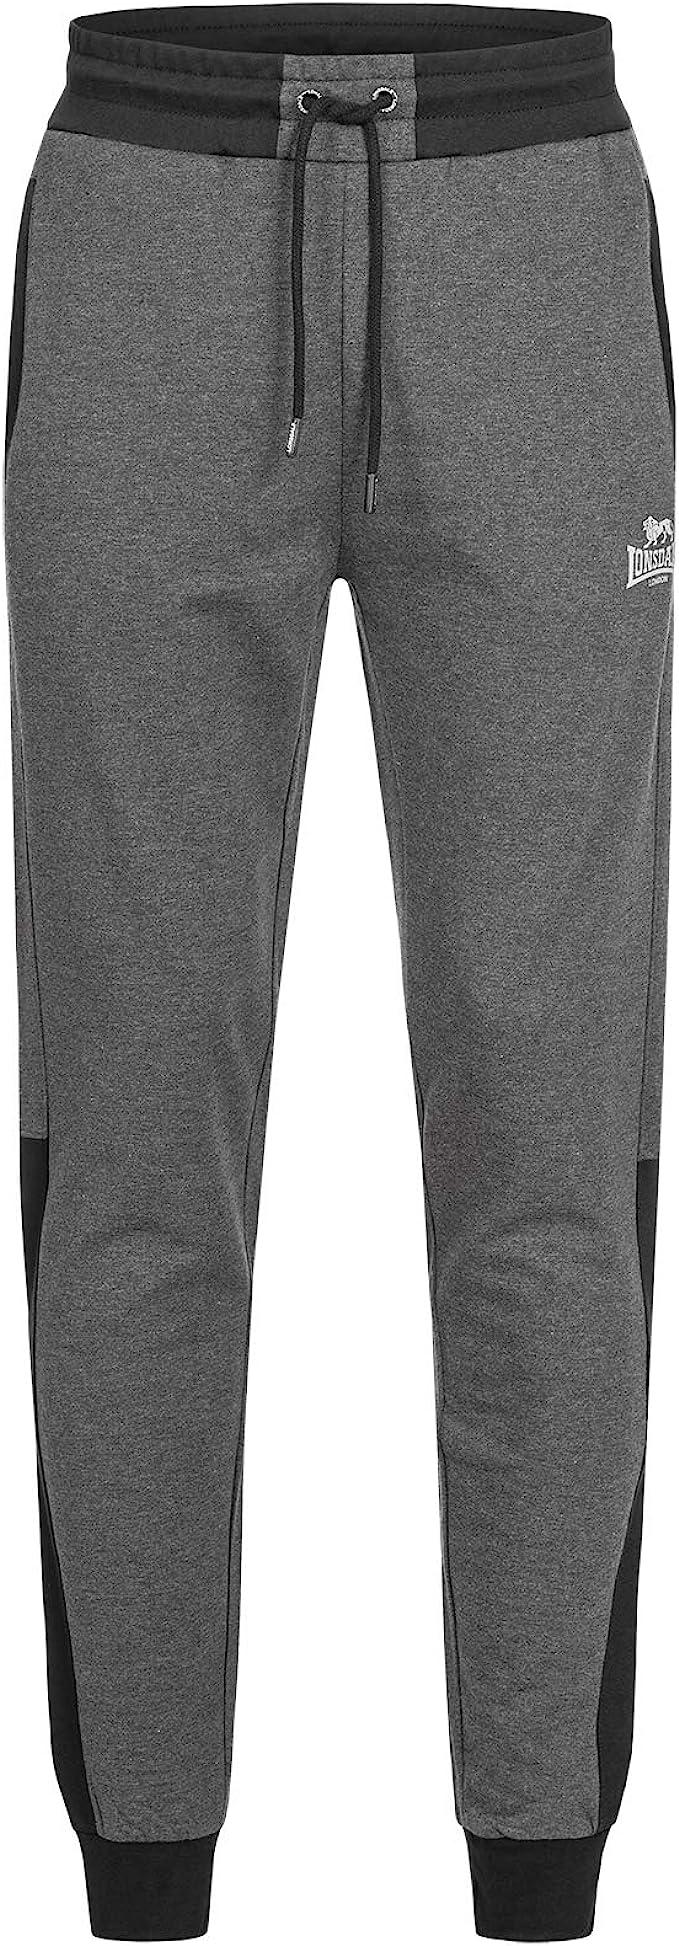 LONSDALE HECKFIELD Pantalones de Deporte & chándal Hommes Gris ...